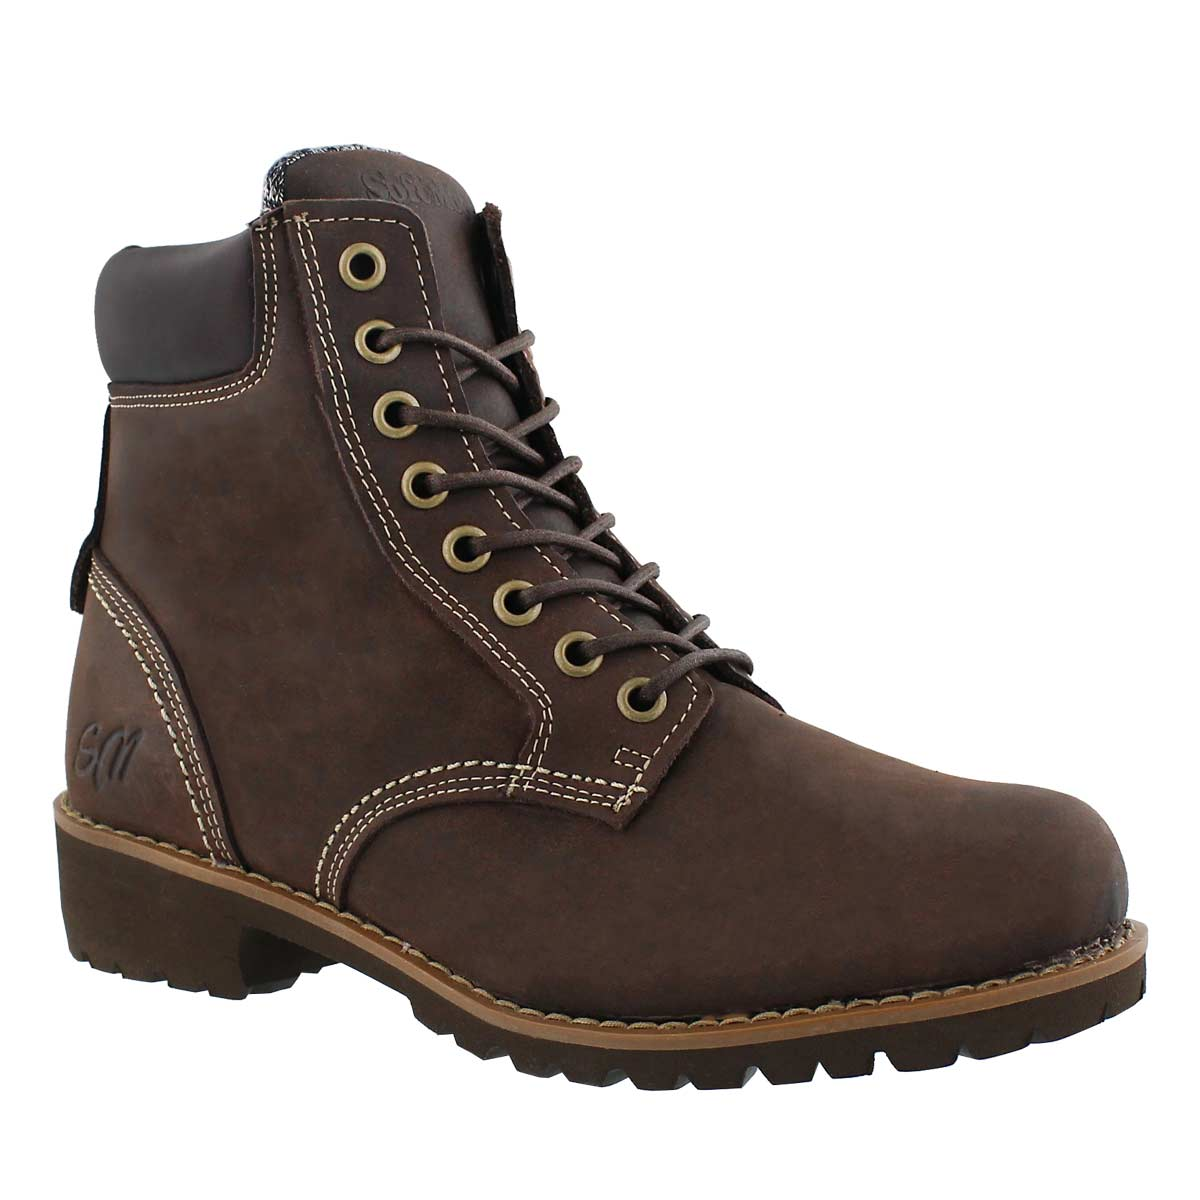 Women's DALISSE2 brown combat boot